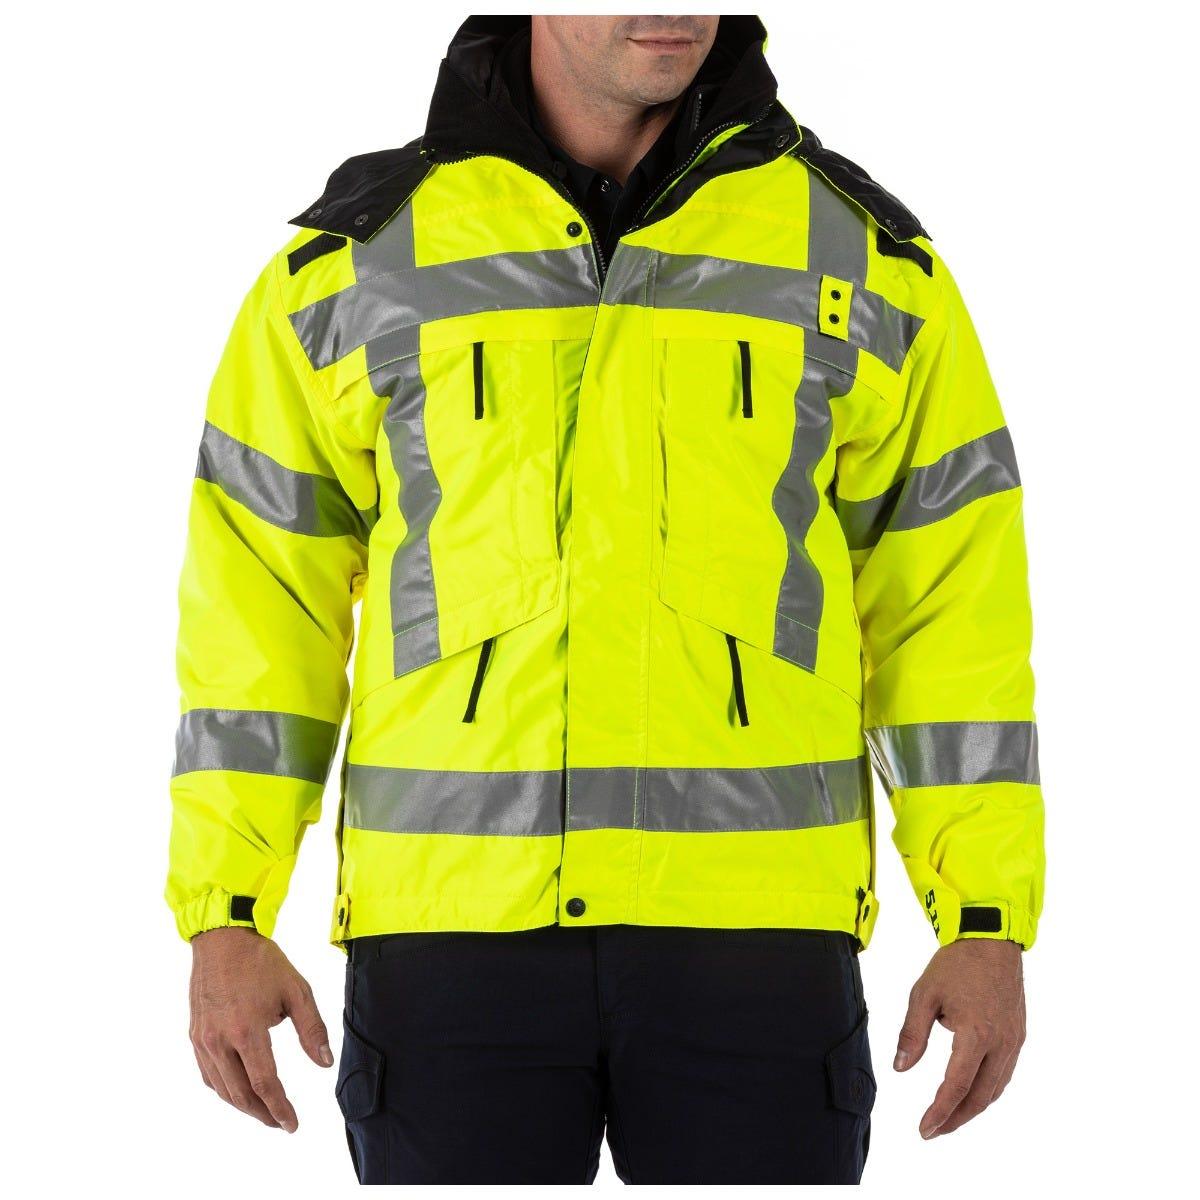 5.11 Tactical Men's 3-in-1 Reversible High-Visibility Parka Jacket (Yellow) thumbnail